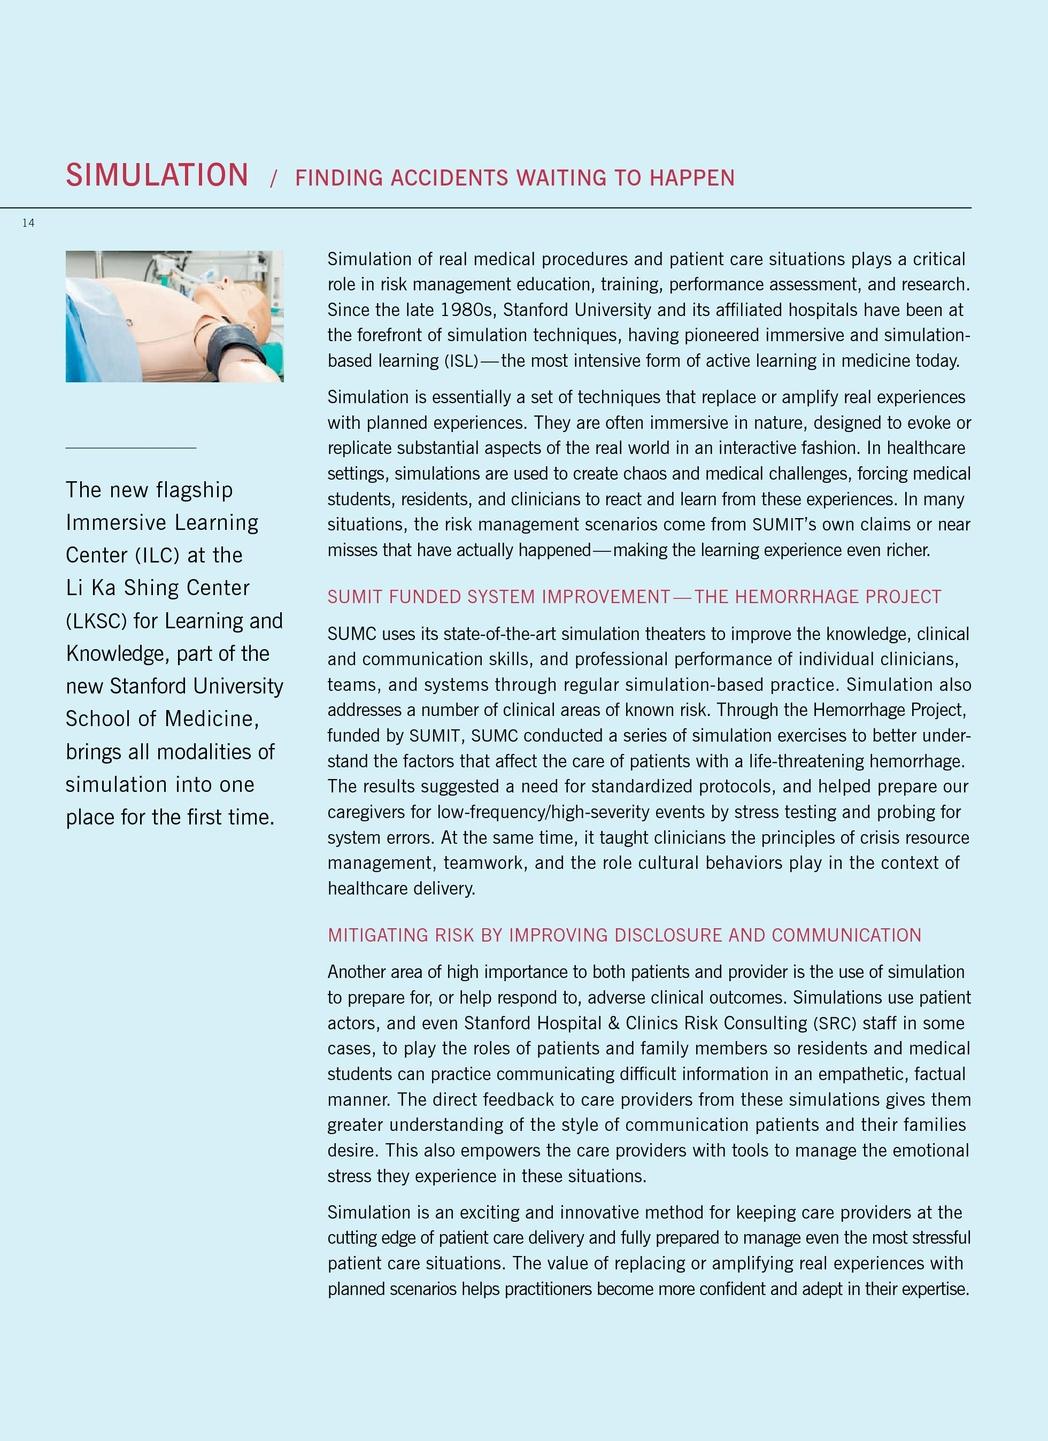 Stanford Medicine Annual Report 2012